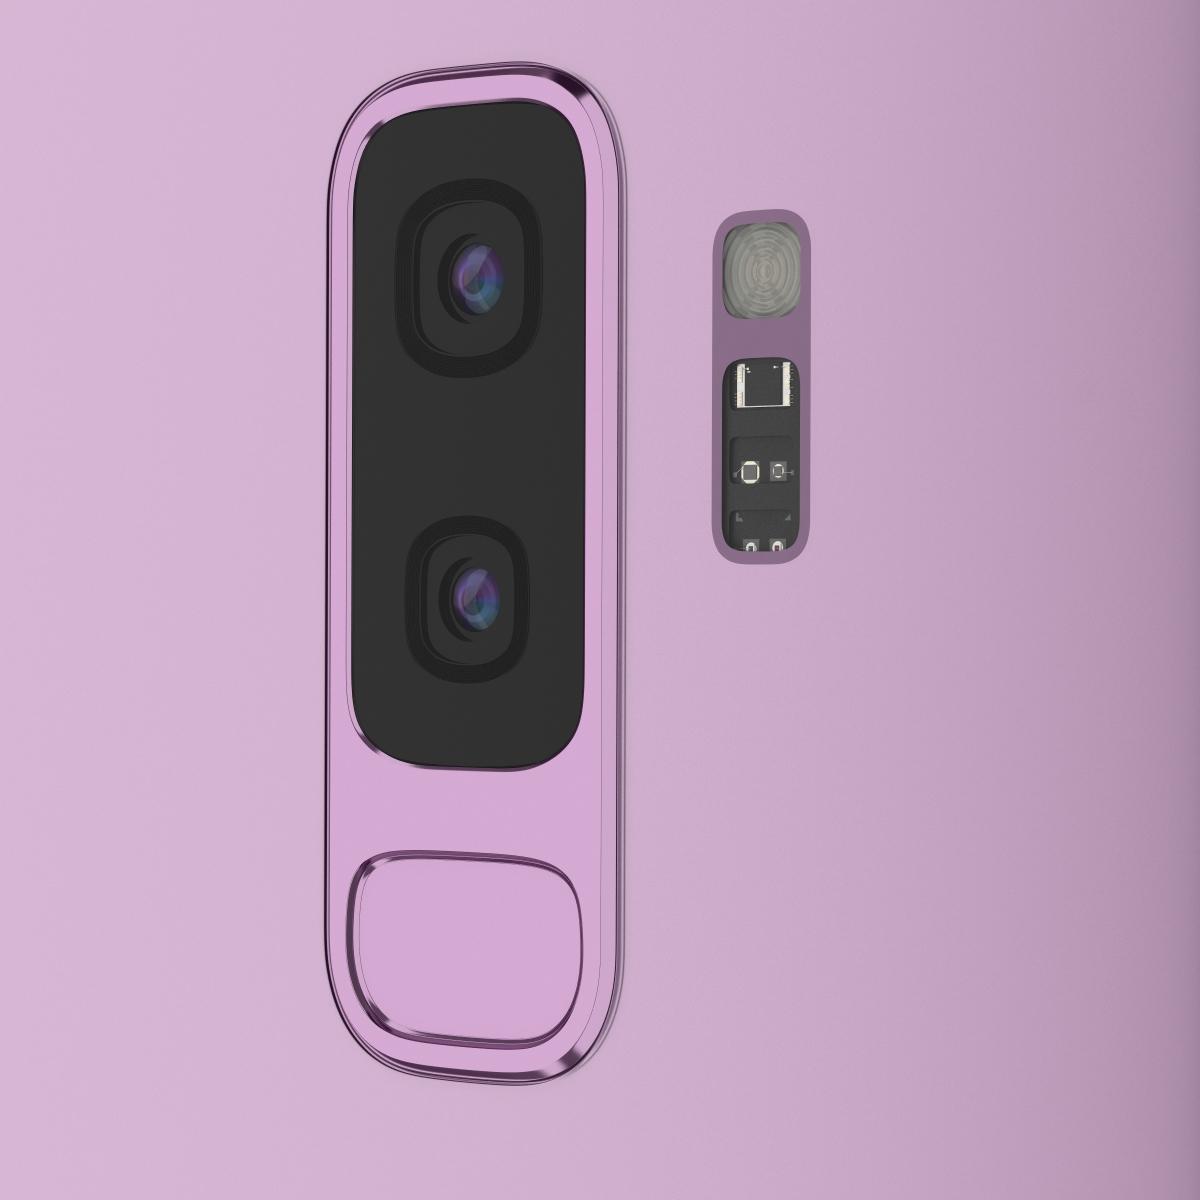 galaxy s9+ Lilac Purple detailing